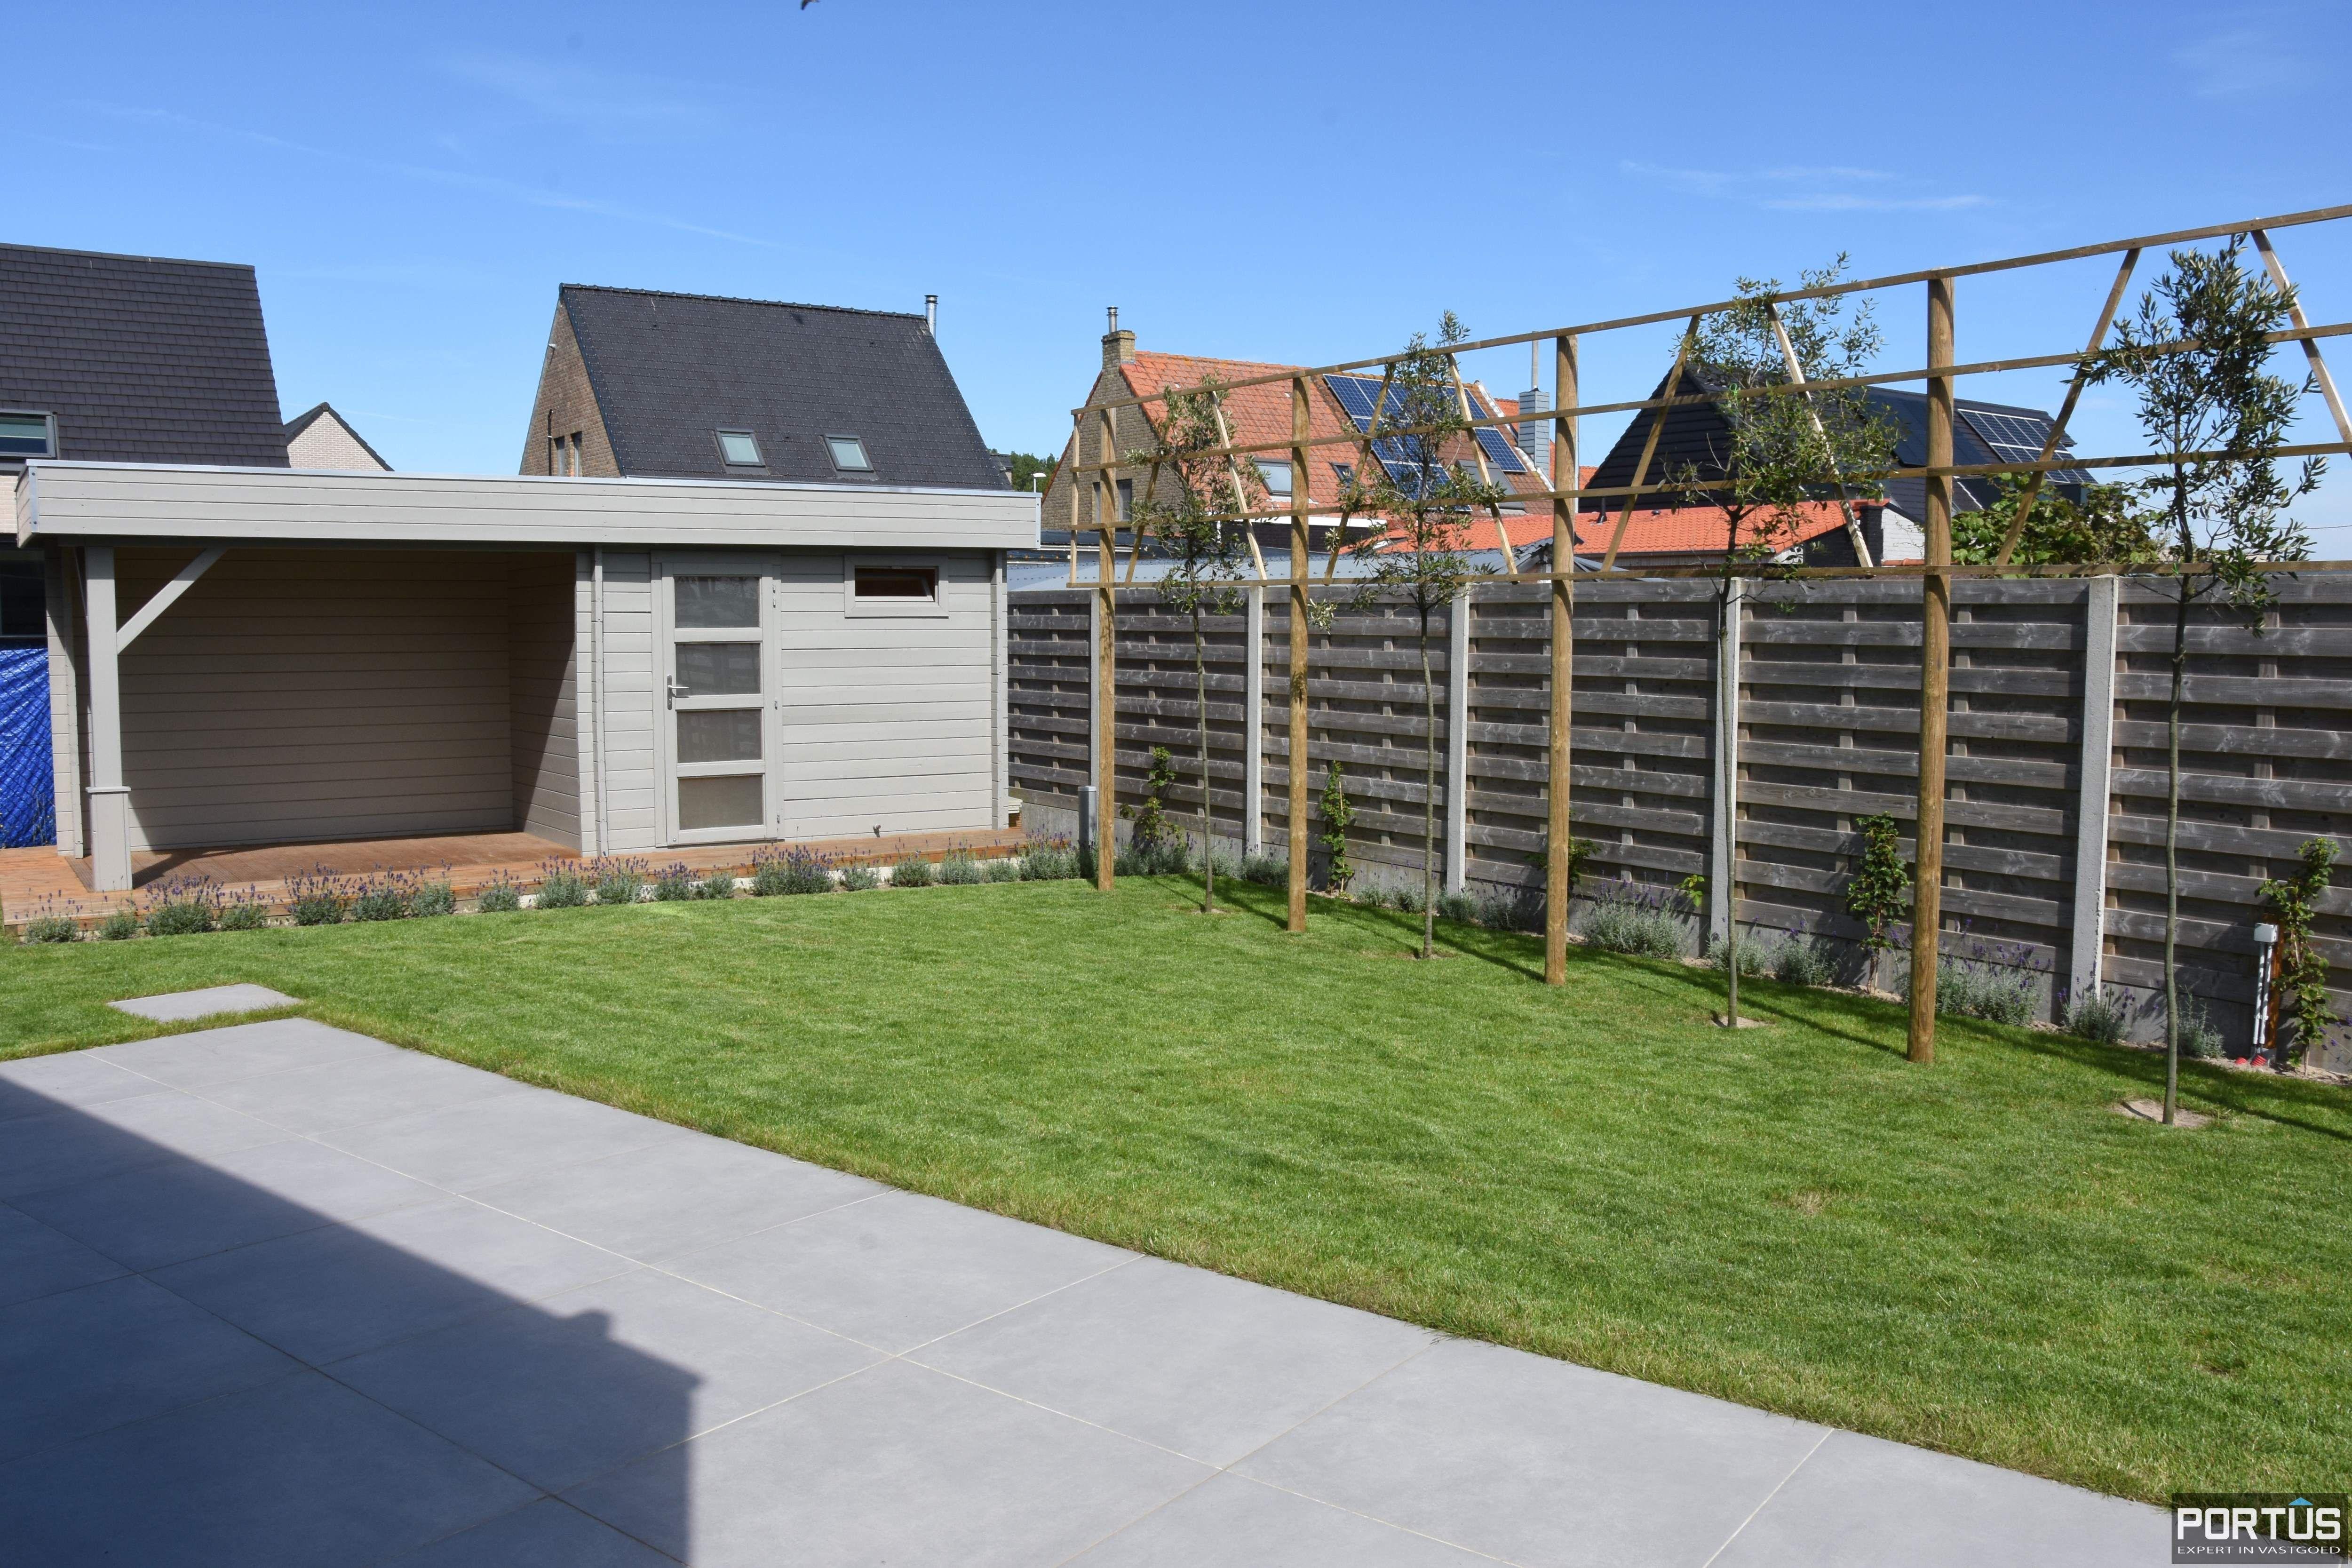 Recente villa te huur met 4 slaapkamers te Westende - 11247